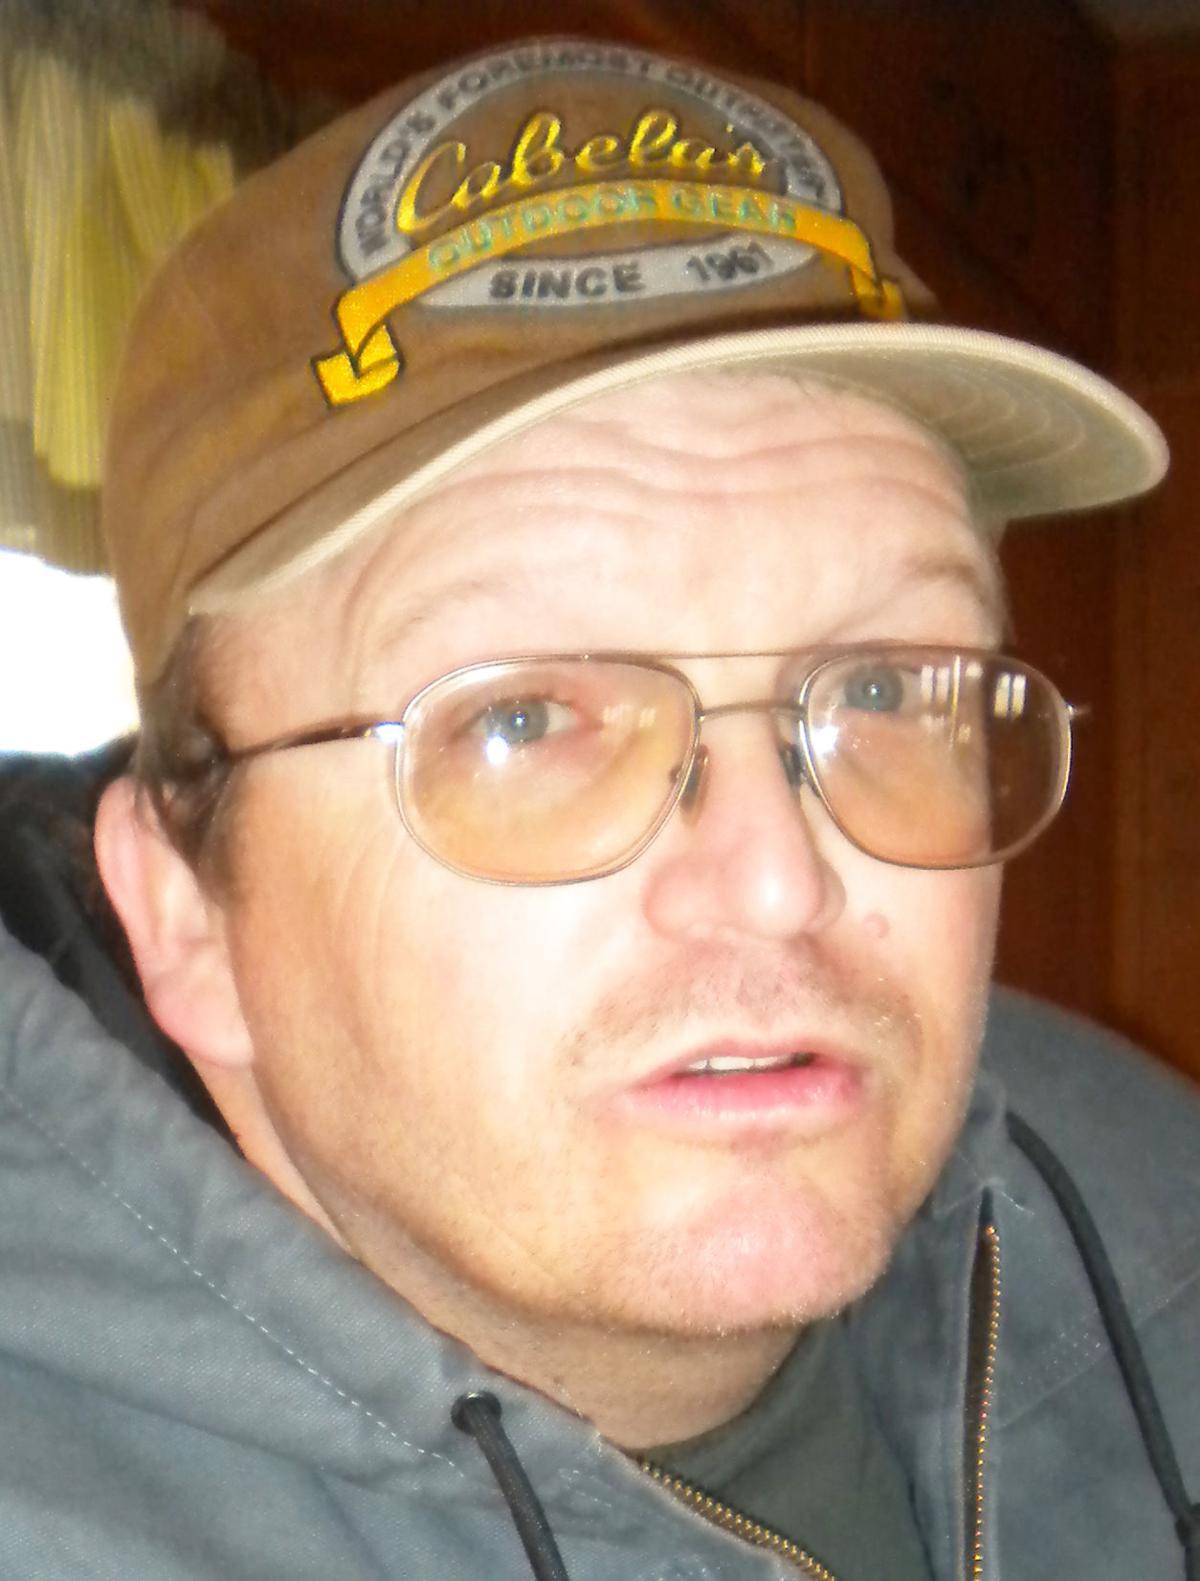 Maurice Kellogg